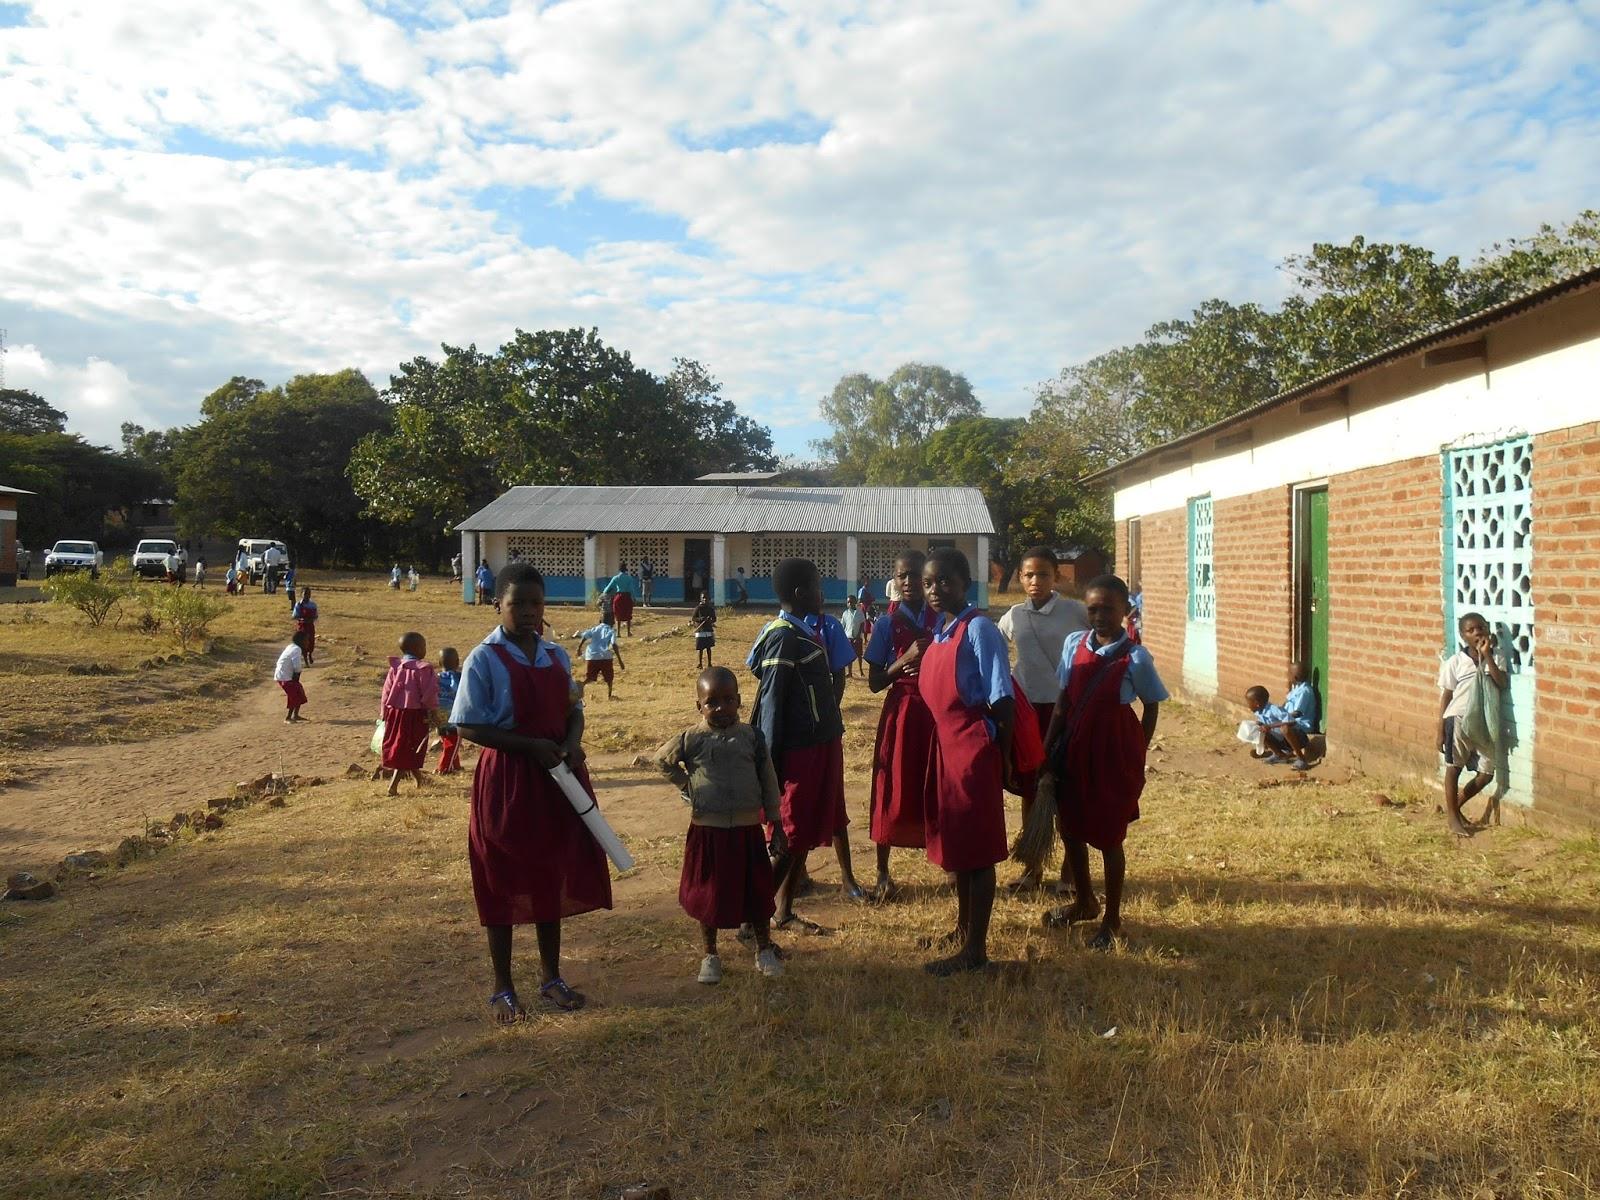 2014 msce results from nkhata bay secondary school